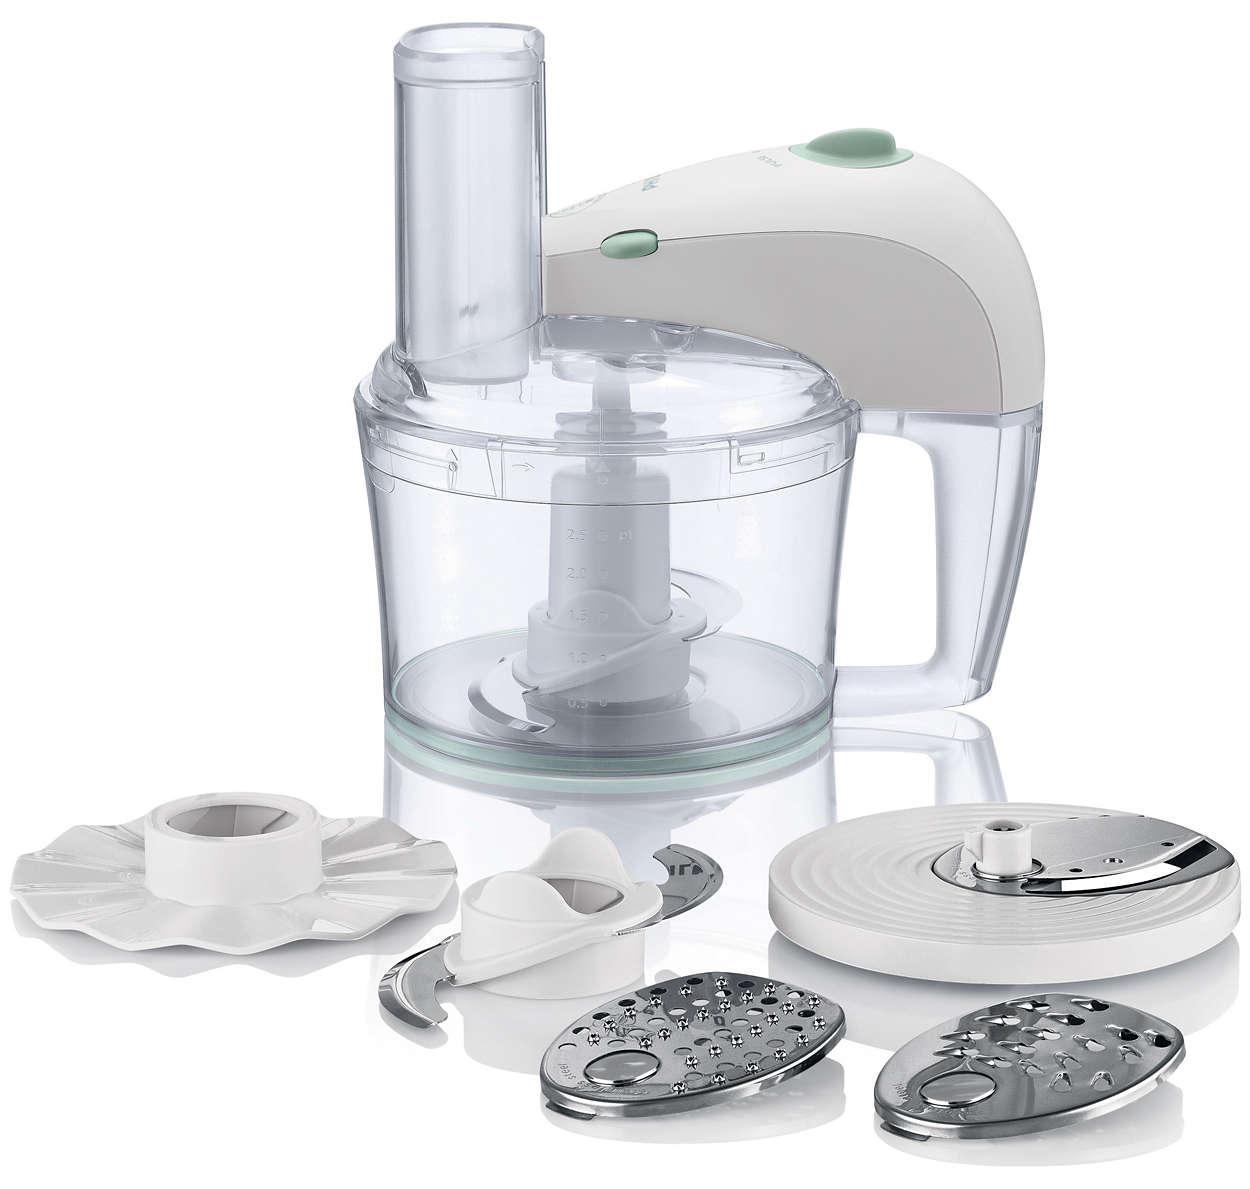 Robot de cocina hr7605 10 philips - Robot de cocina philips ...